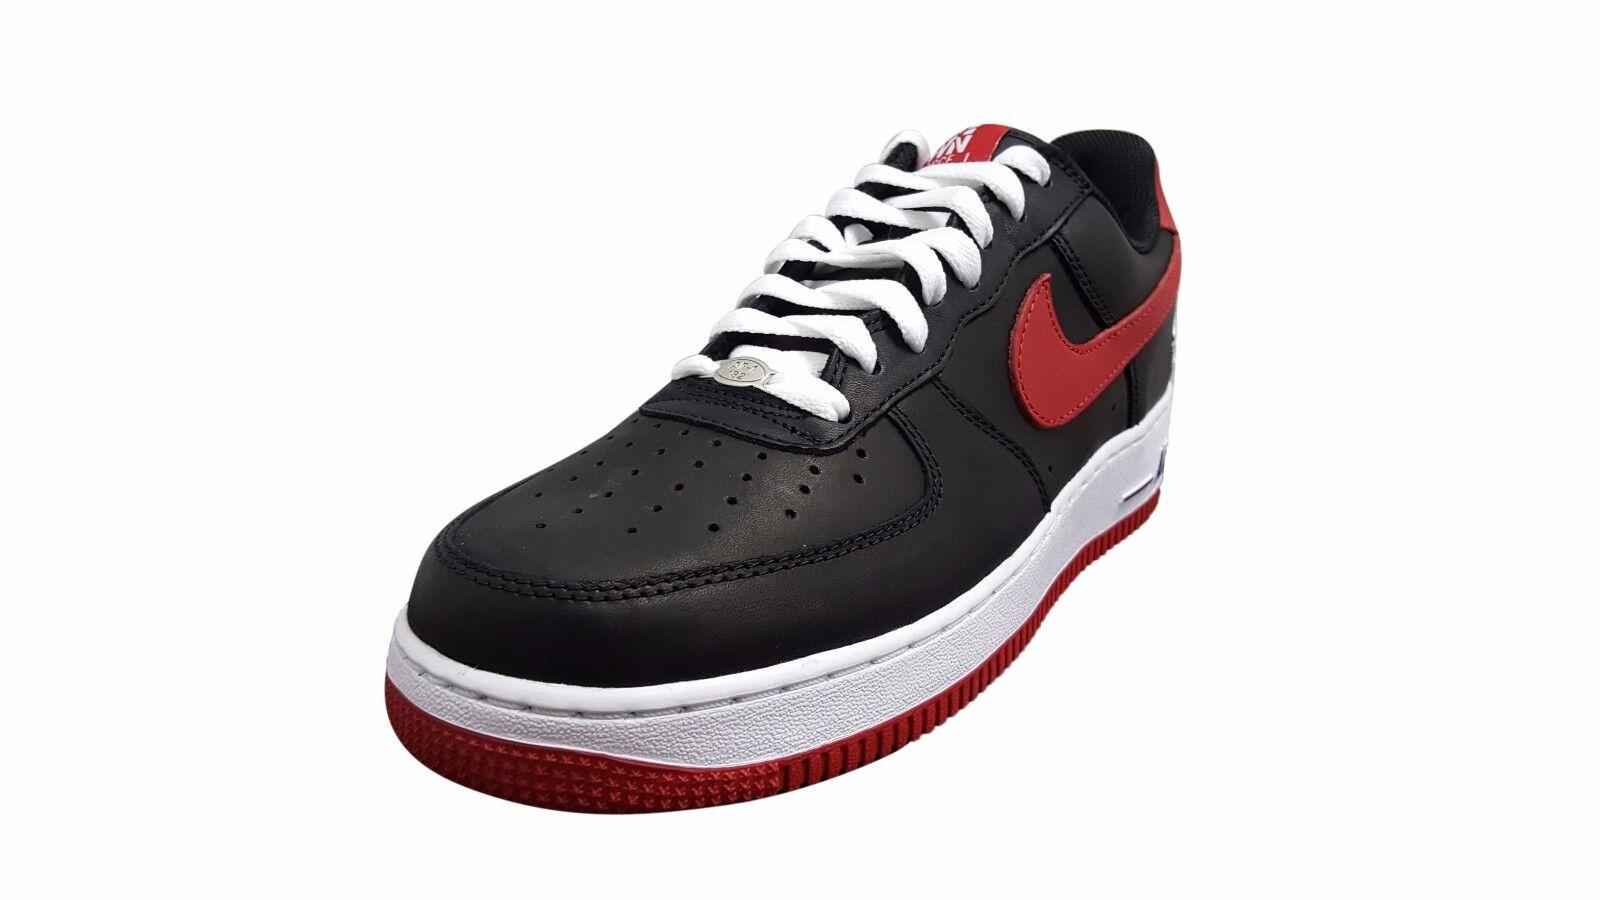 Nike Air Force 1 Low Retro Black/Varsity Red-White (845053 001)